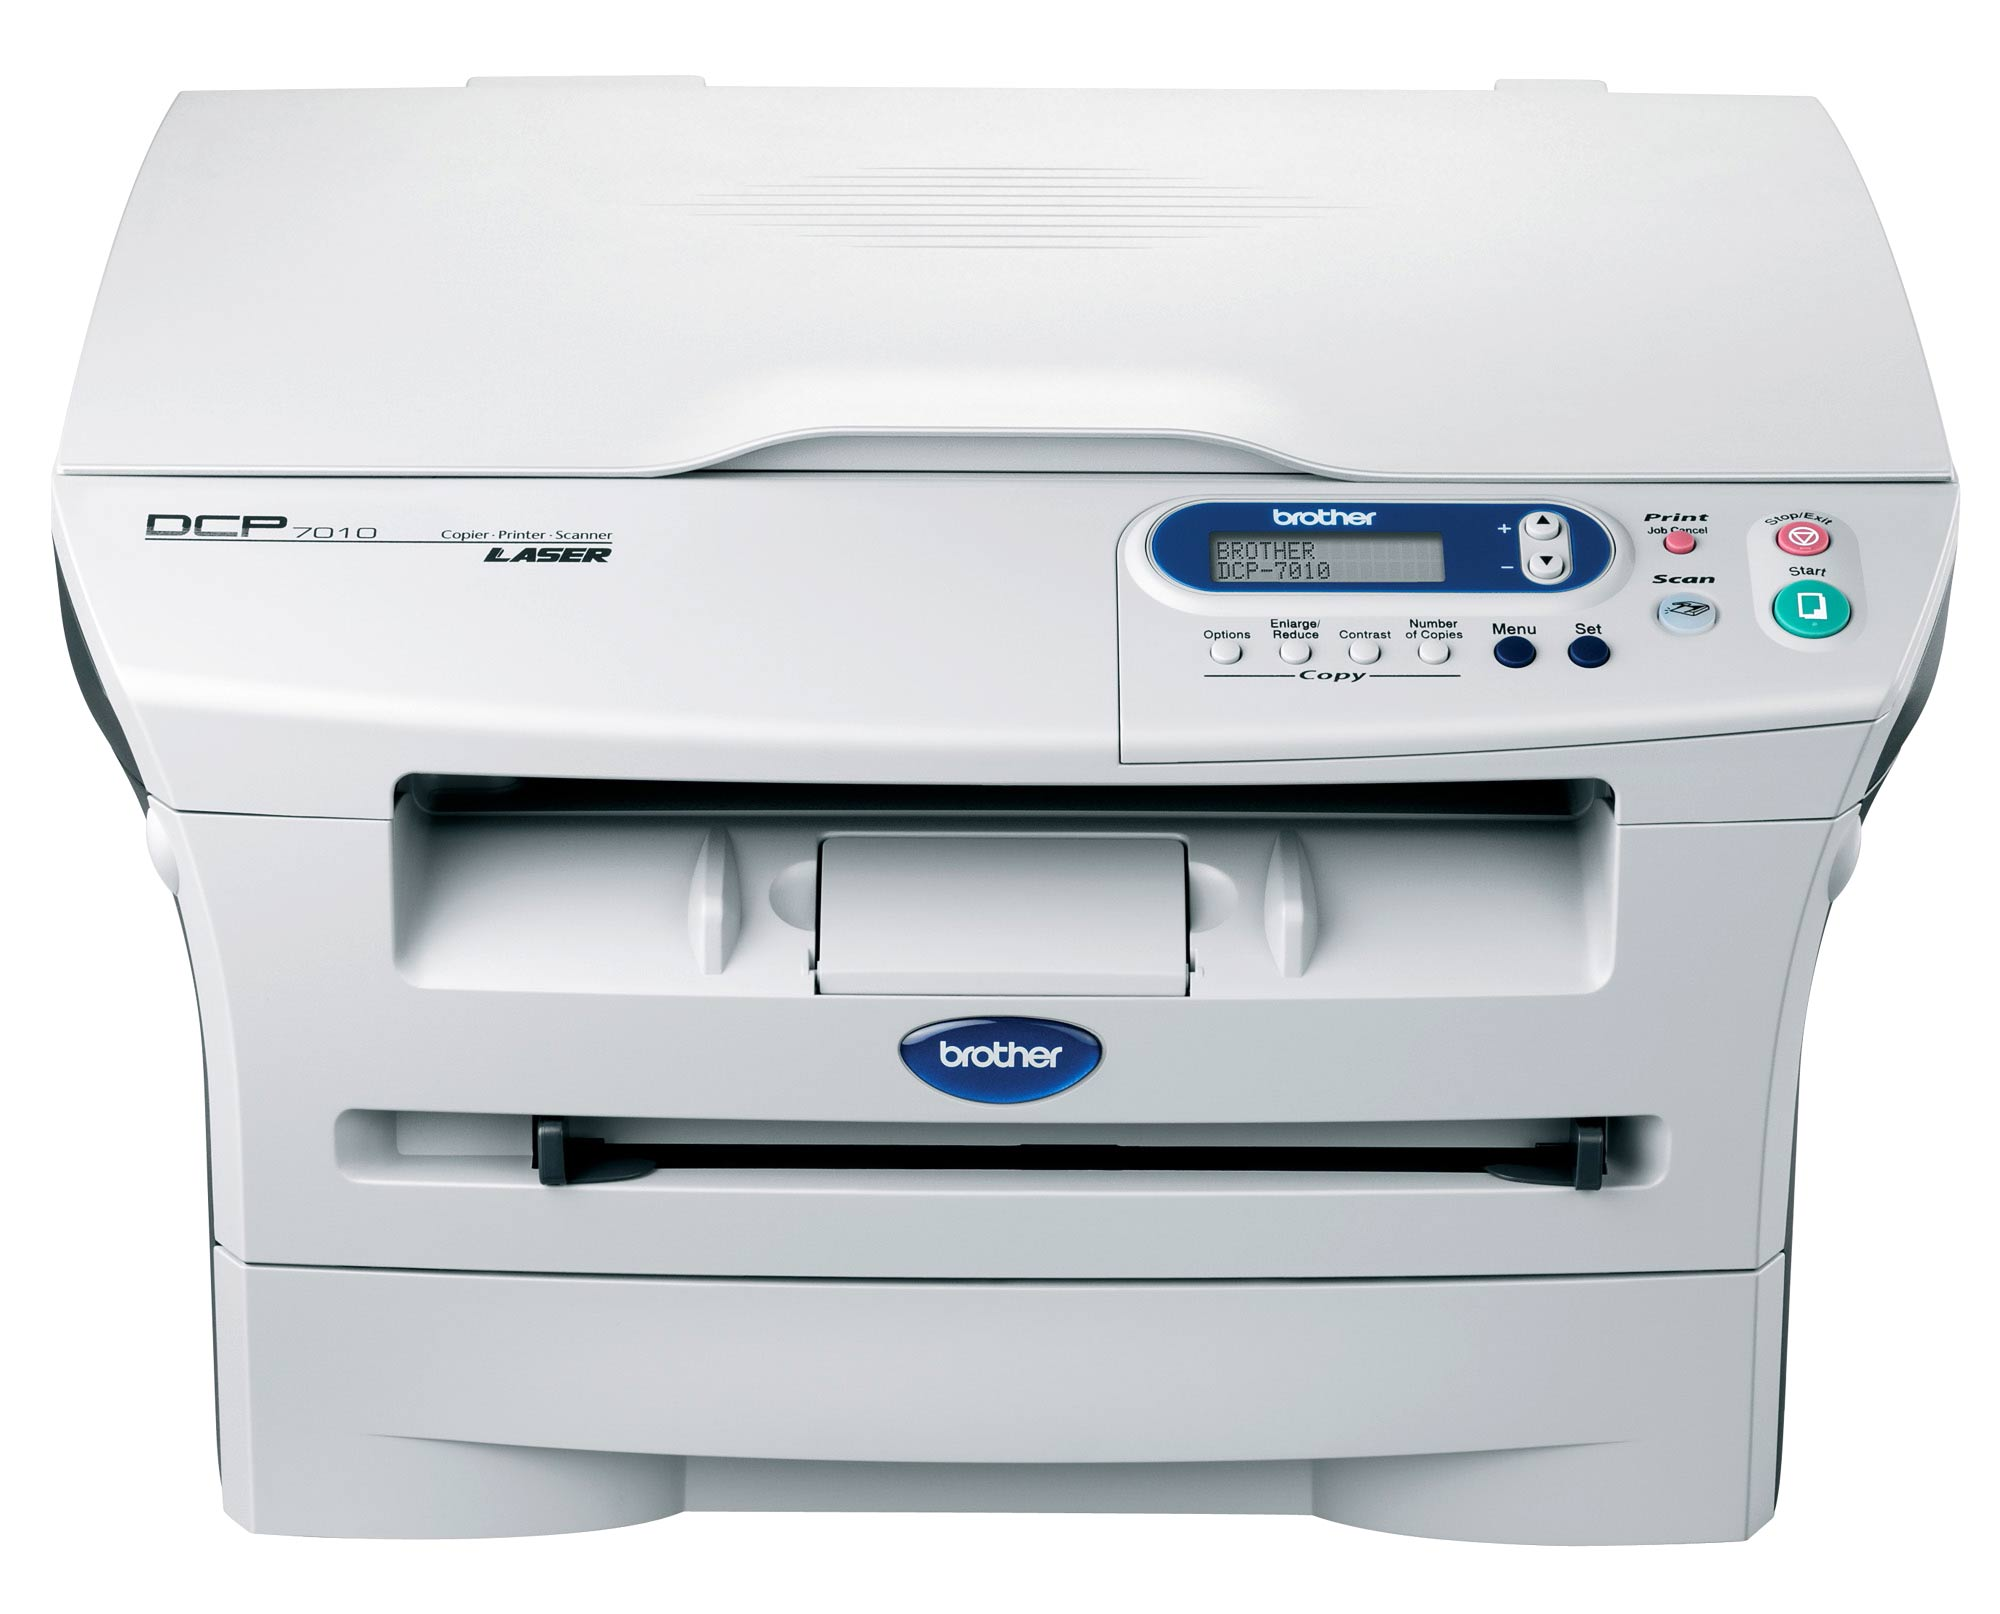 Принтер Brother DCP-7010